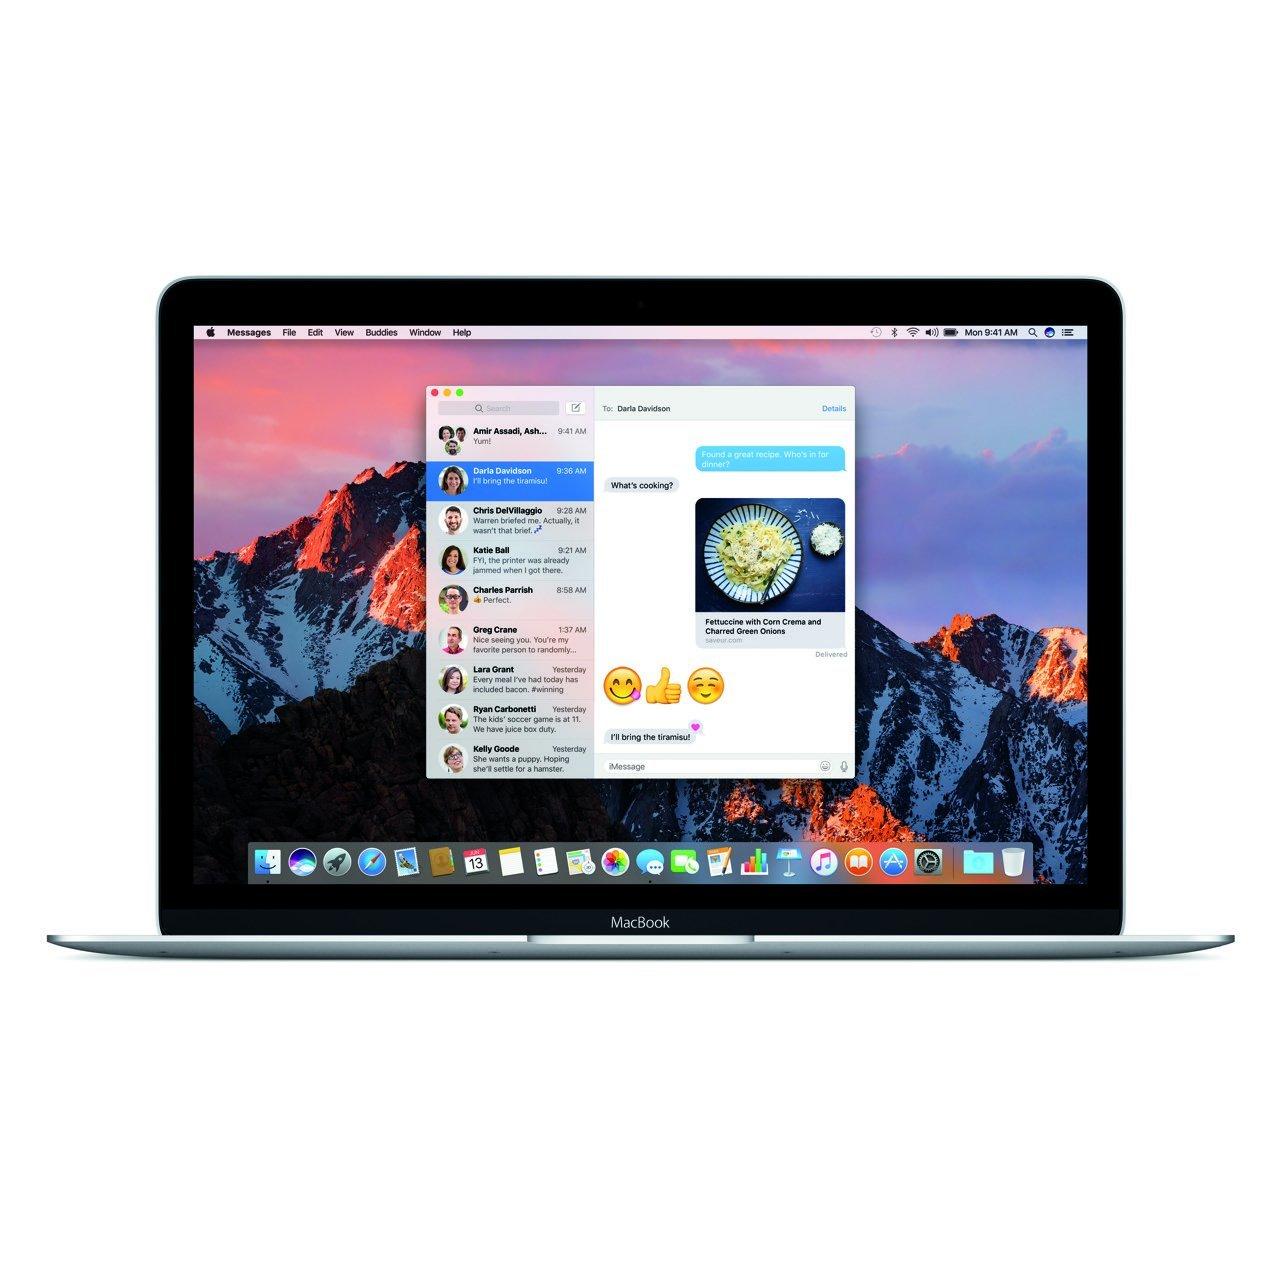 macOS Sierra Nachrichten-App (MacBook) - Apple